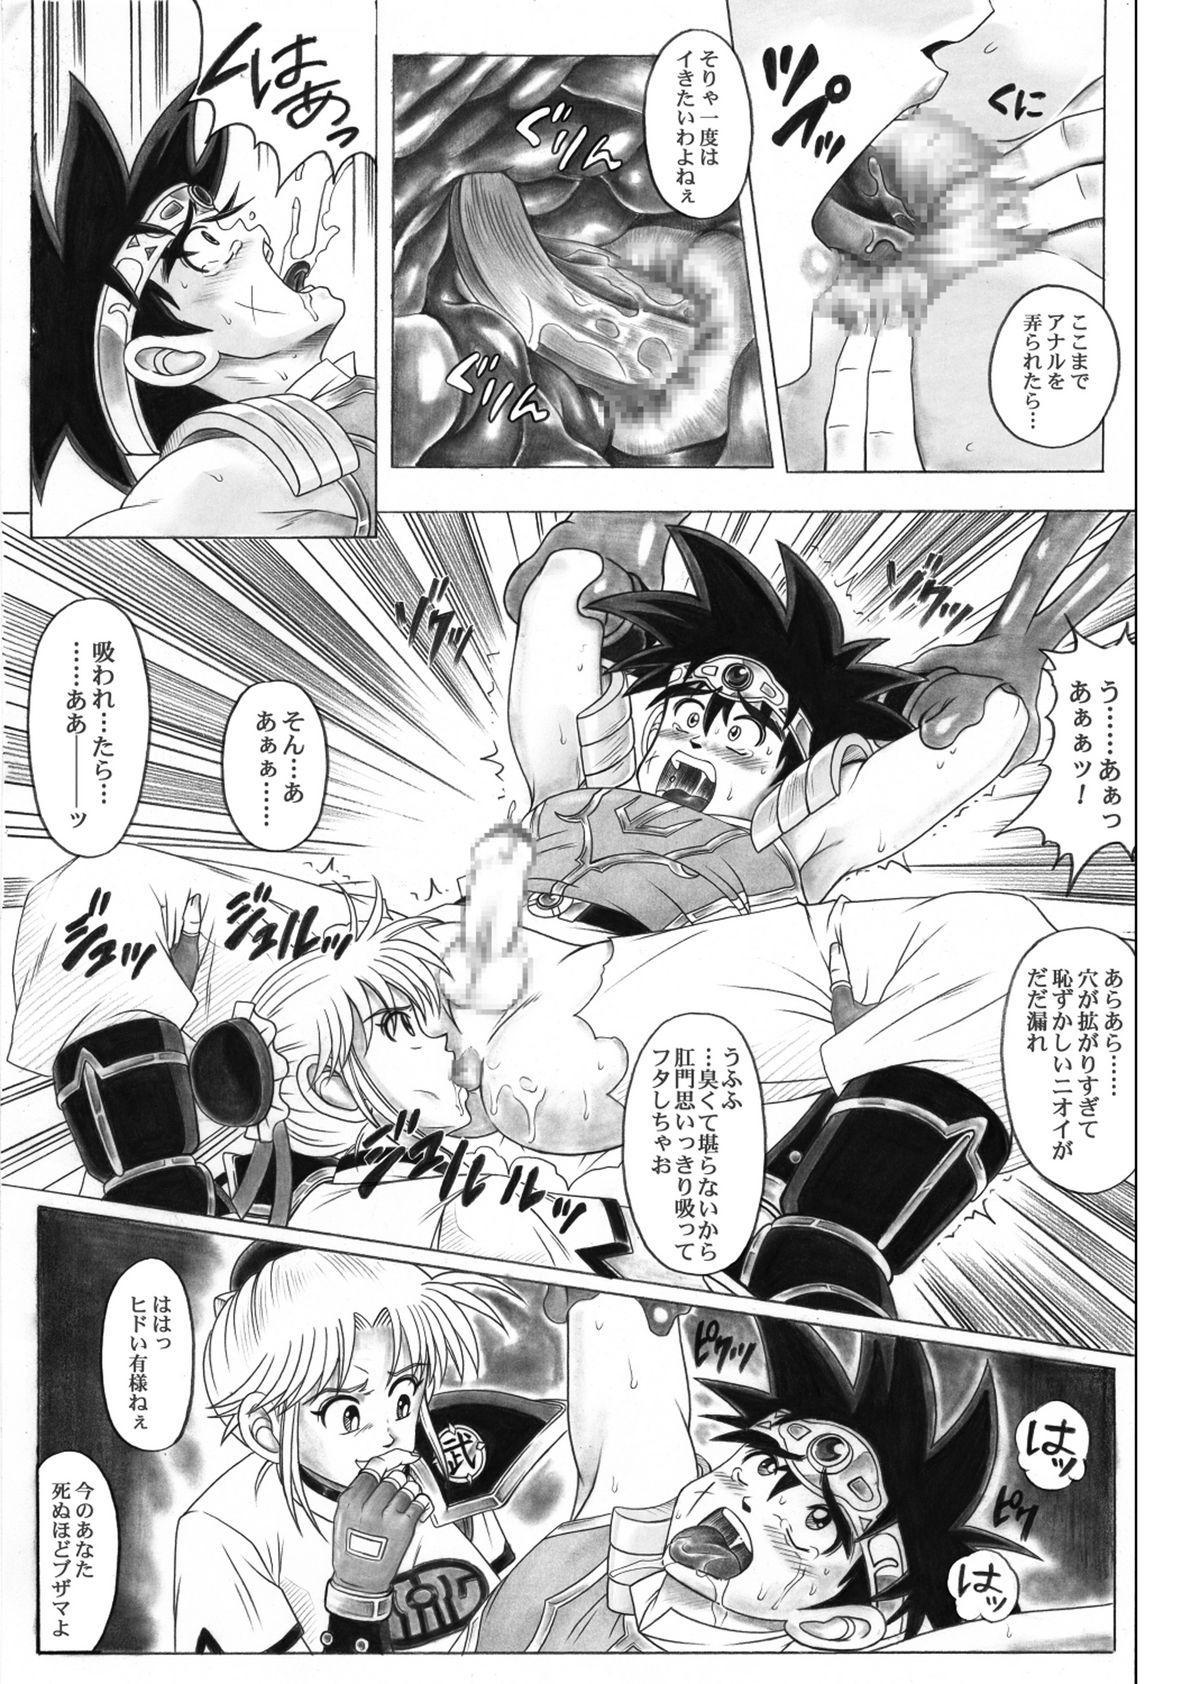 [Cyclone (Reizei, Izumi)] STAR TAC IDO ~Youkuso Haja no Doukutsu he~ Chuuhen Download edition (Dragon Warrior: Dai's Great Adventure) [Digital] 60